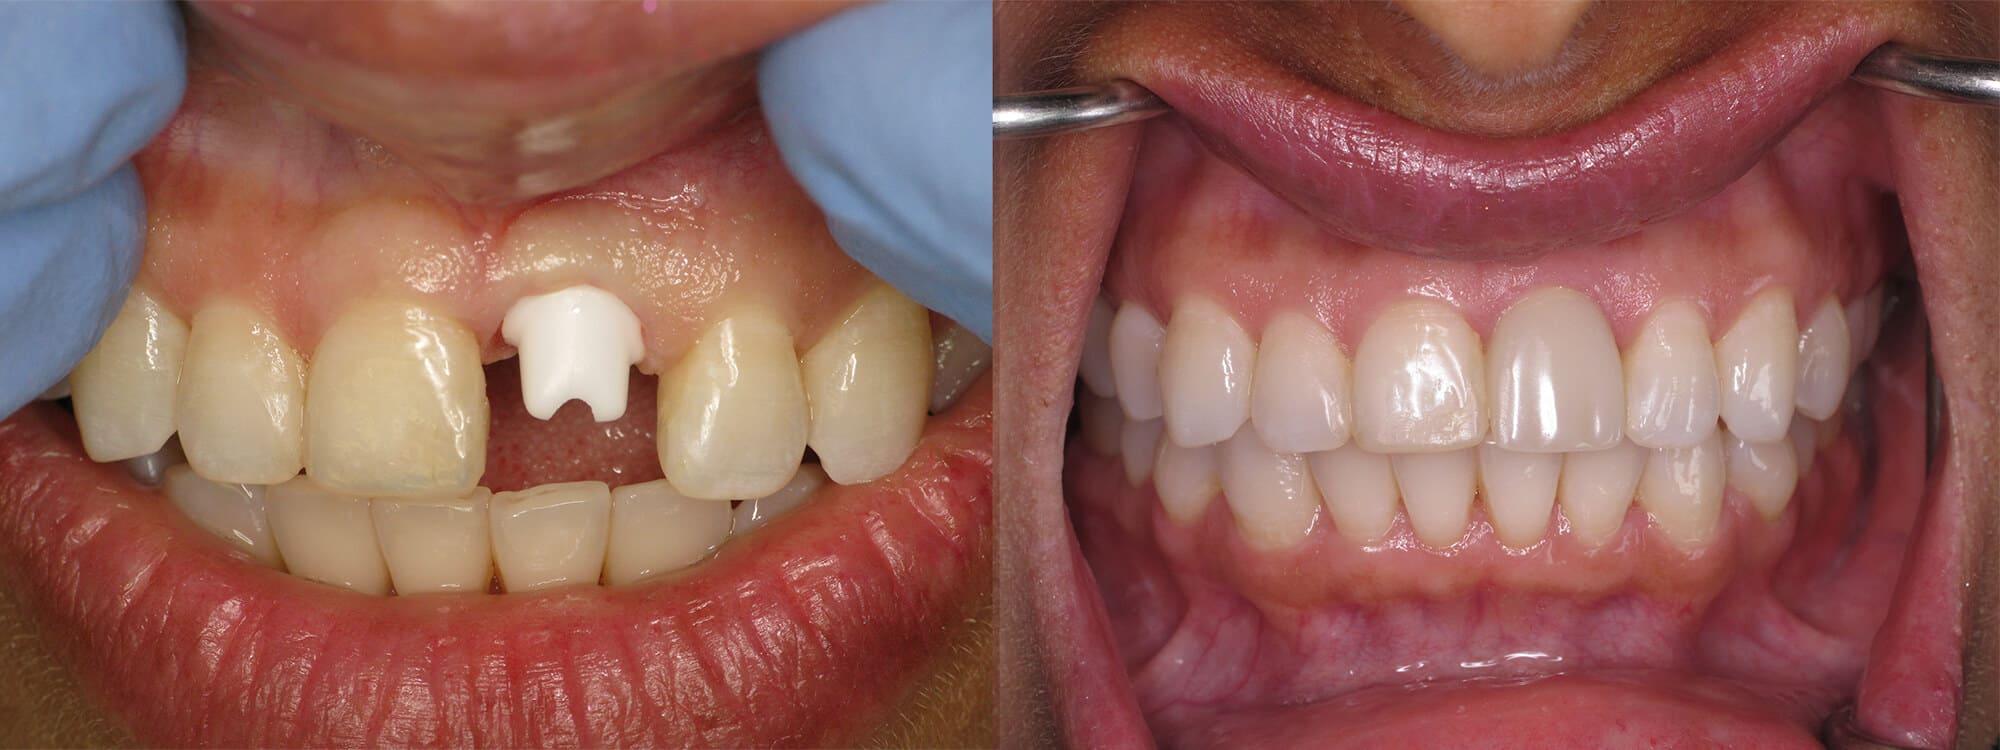 Holistic Dental Alternatives